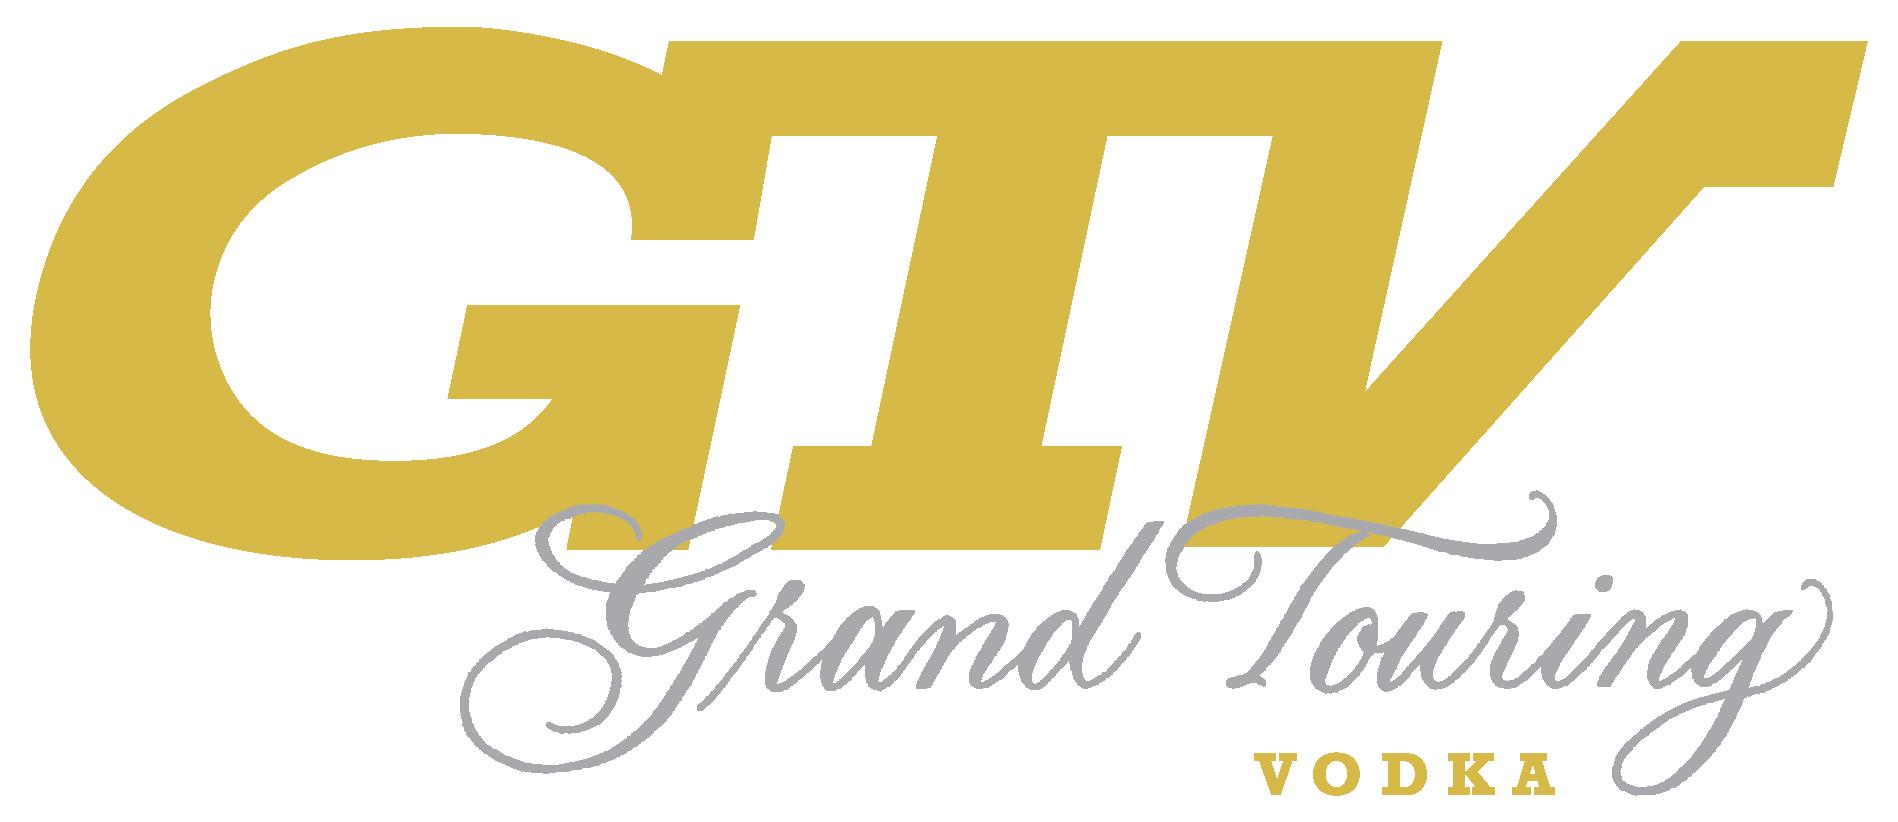 GTV grand touring